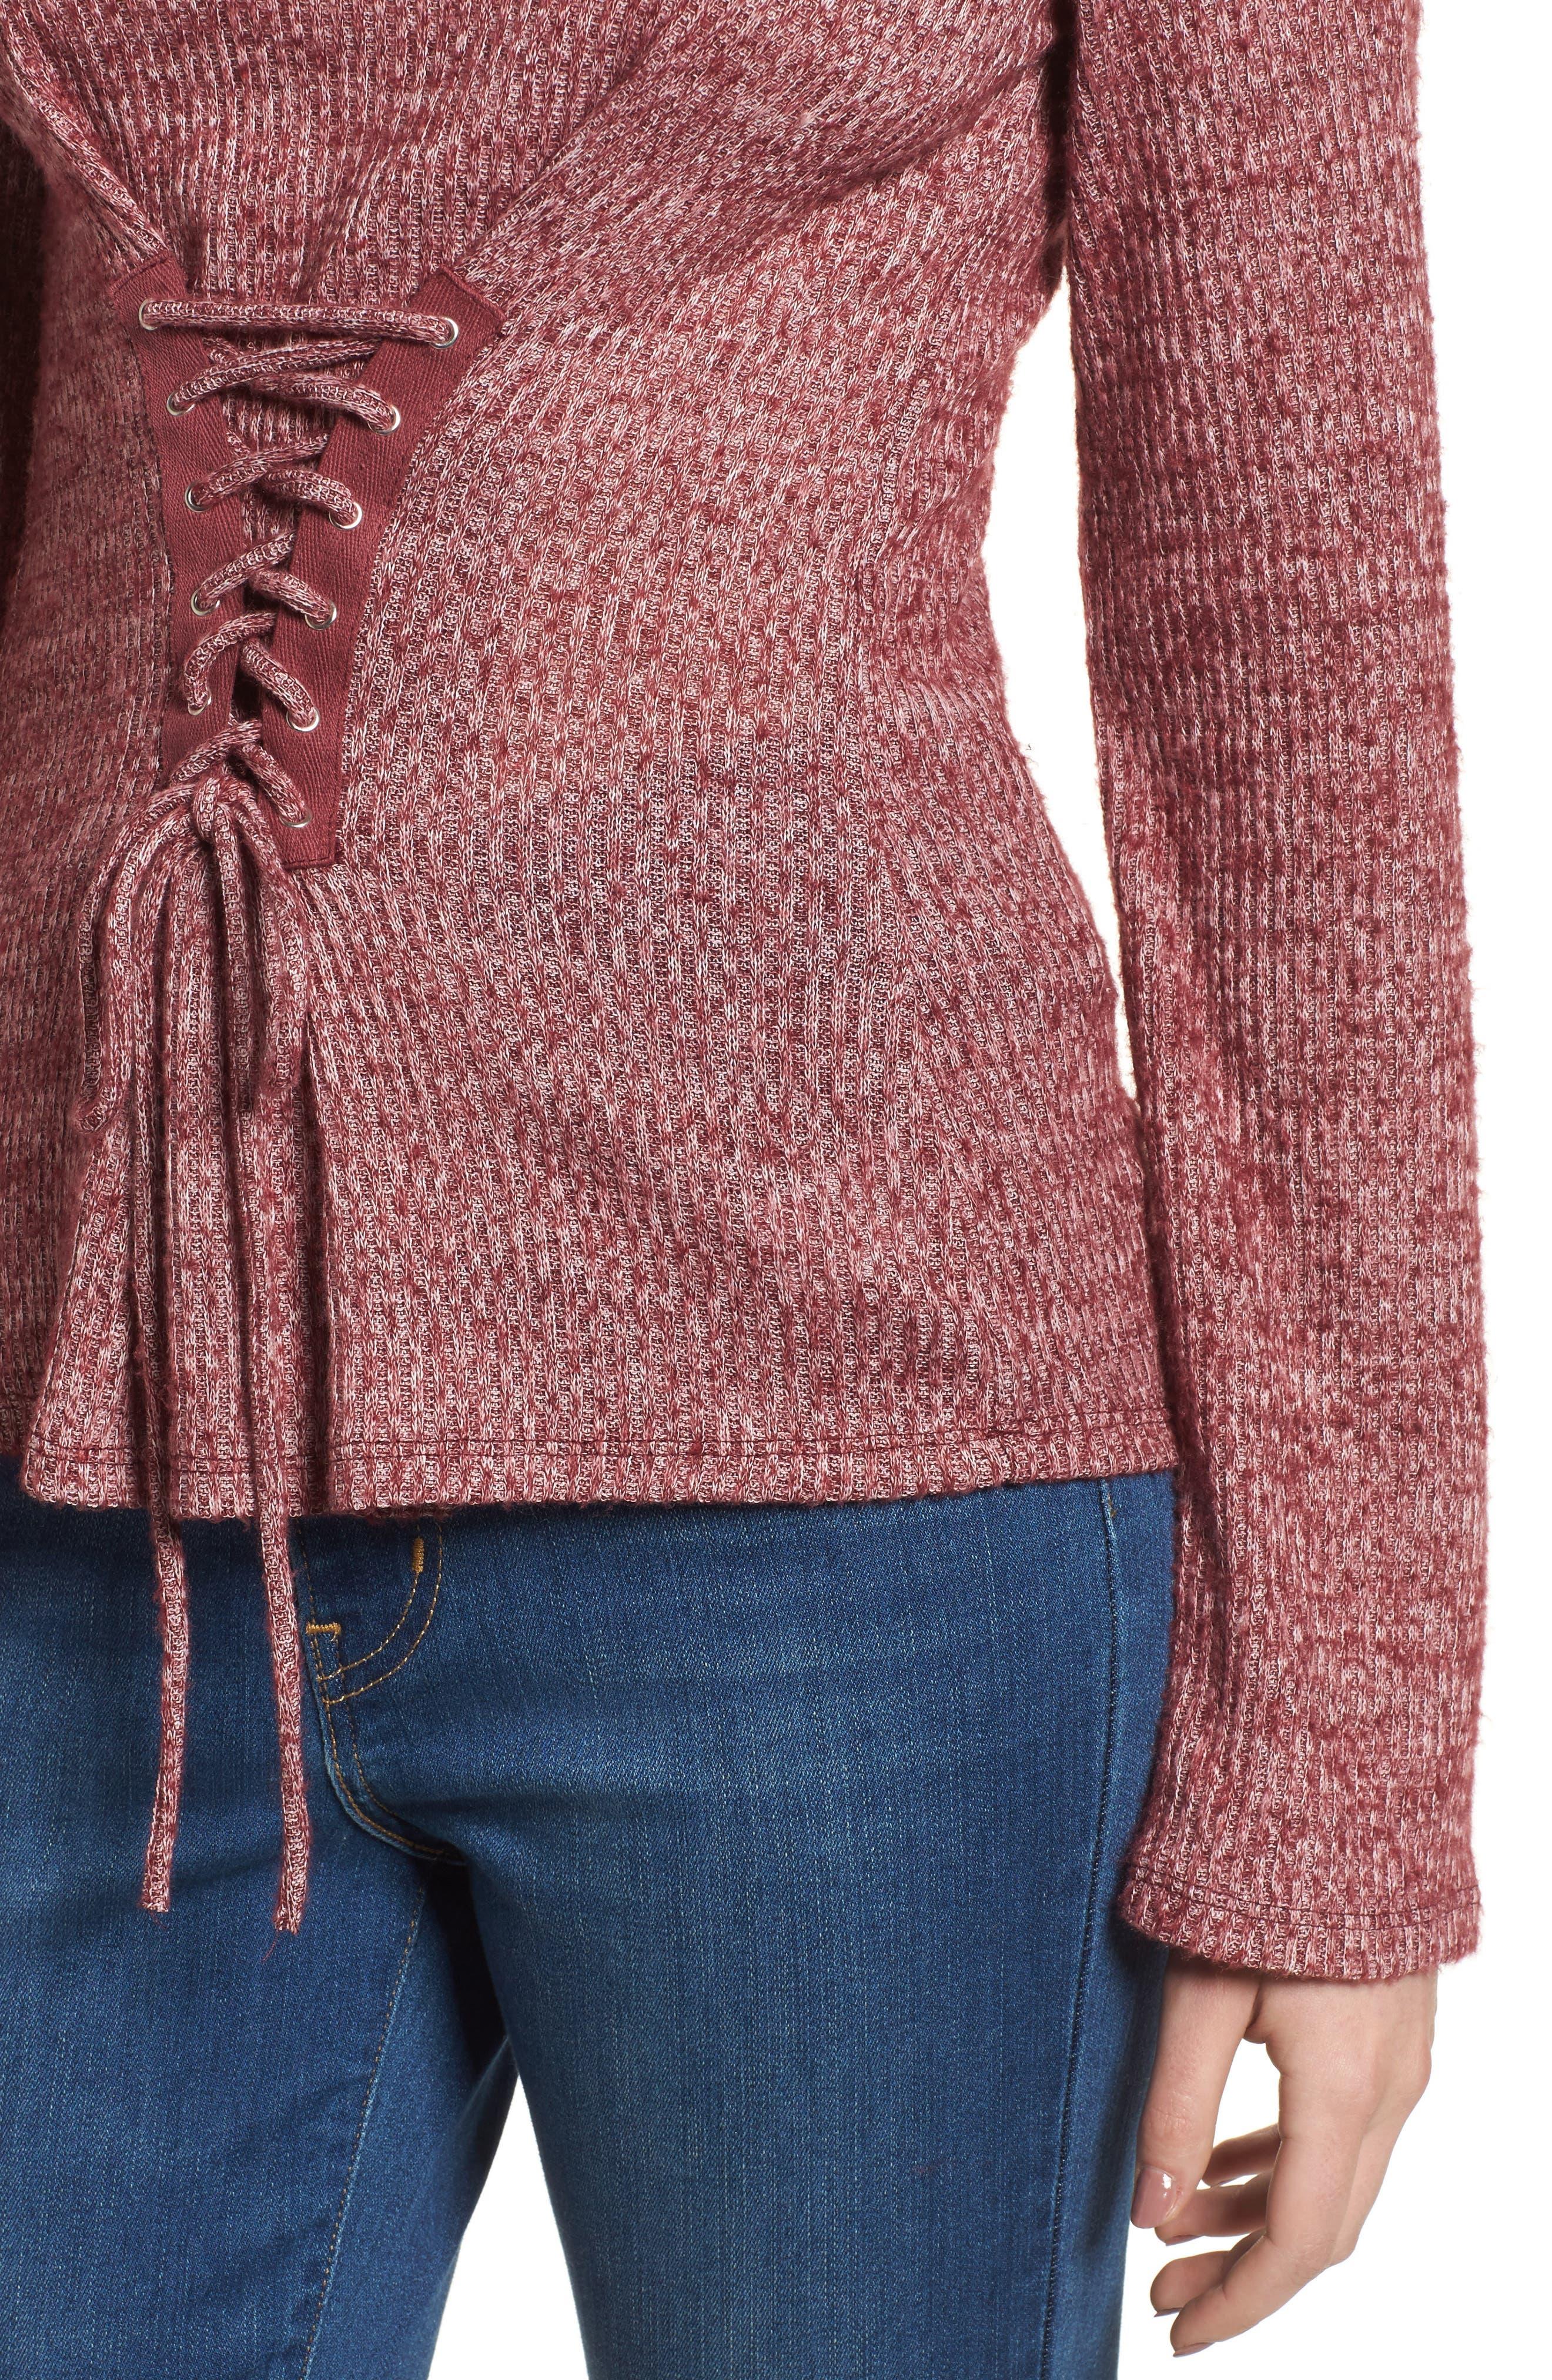 Rib Knit Corset Top,                             Alternate thumbnail 4, color,                             Burgundy Royale